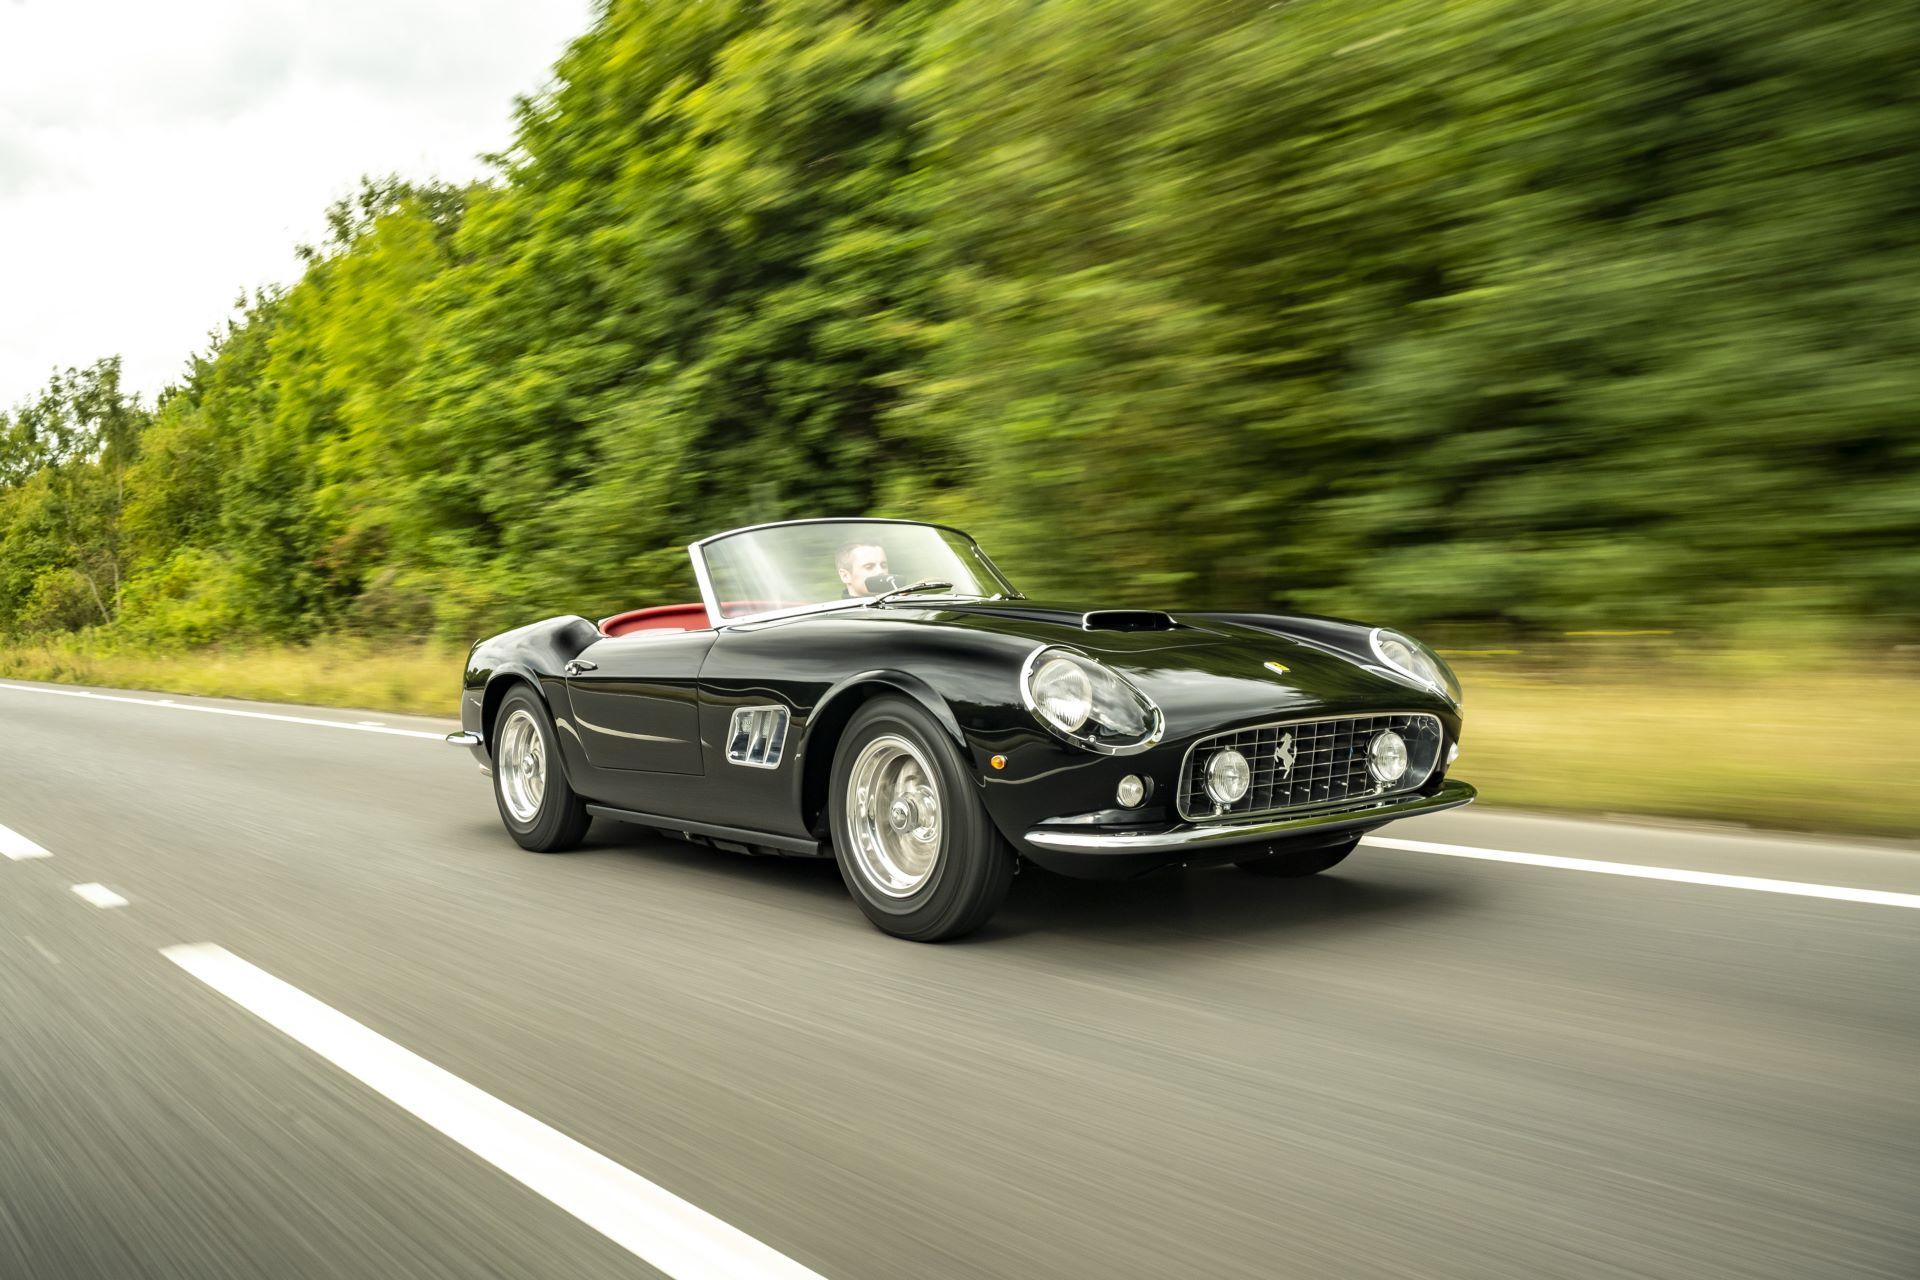 Ferrari-California-Spyder-by-GTO-Engineering-3